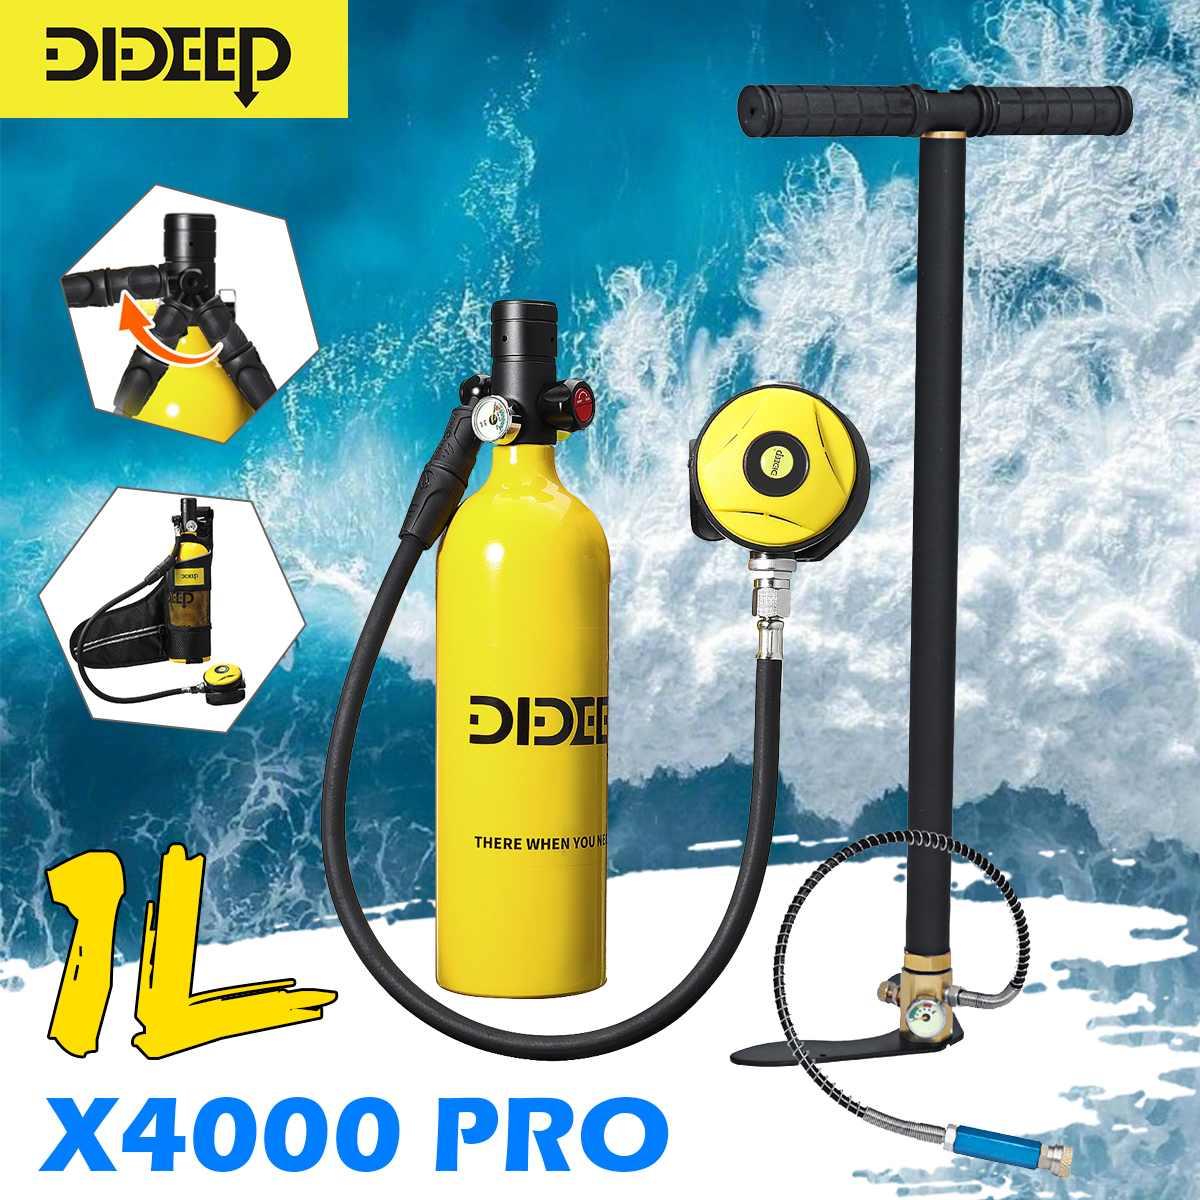 DIDEEP 1L Scuba Diving Cylinder Mini Oxygen Tank Set Dive Respirator Air Tank Hand Pump For Snorkeling Breath Diving Equipment